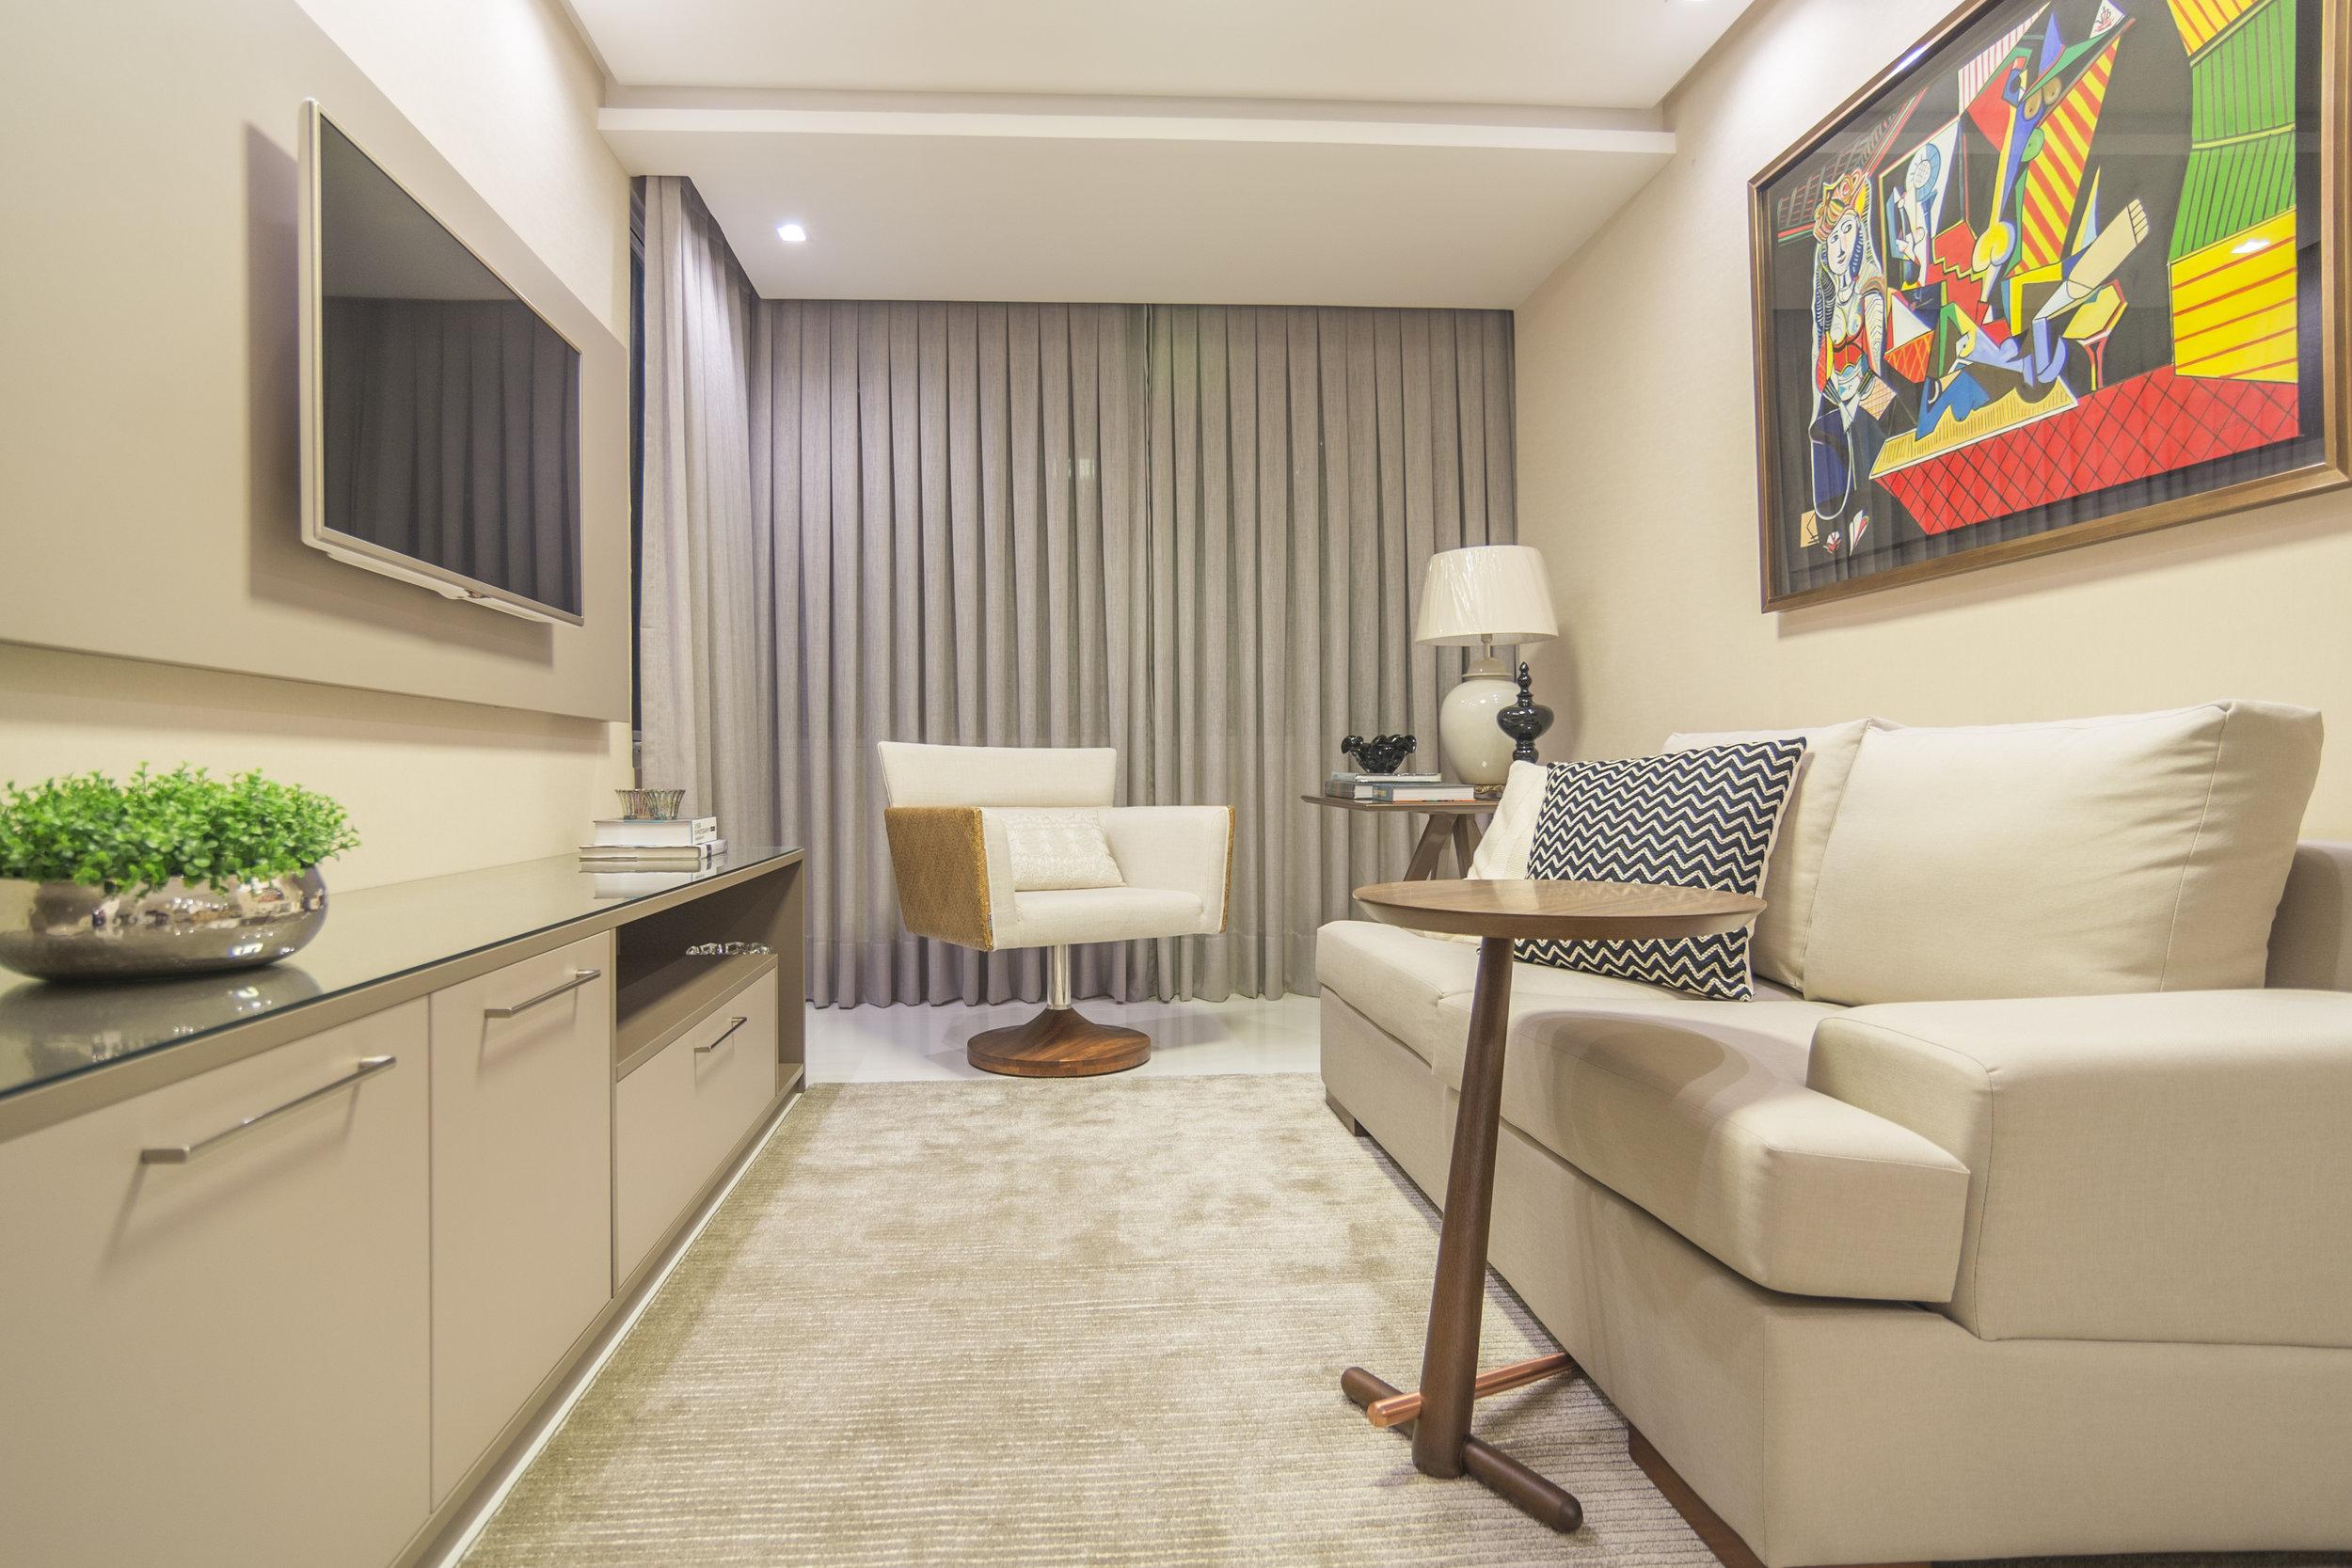 projeto-arquitetonico-robertoindira-duo-arquitetura-apartamentos-estar-05.jpg